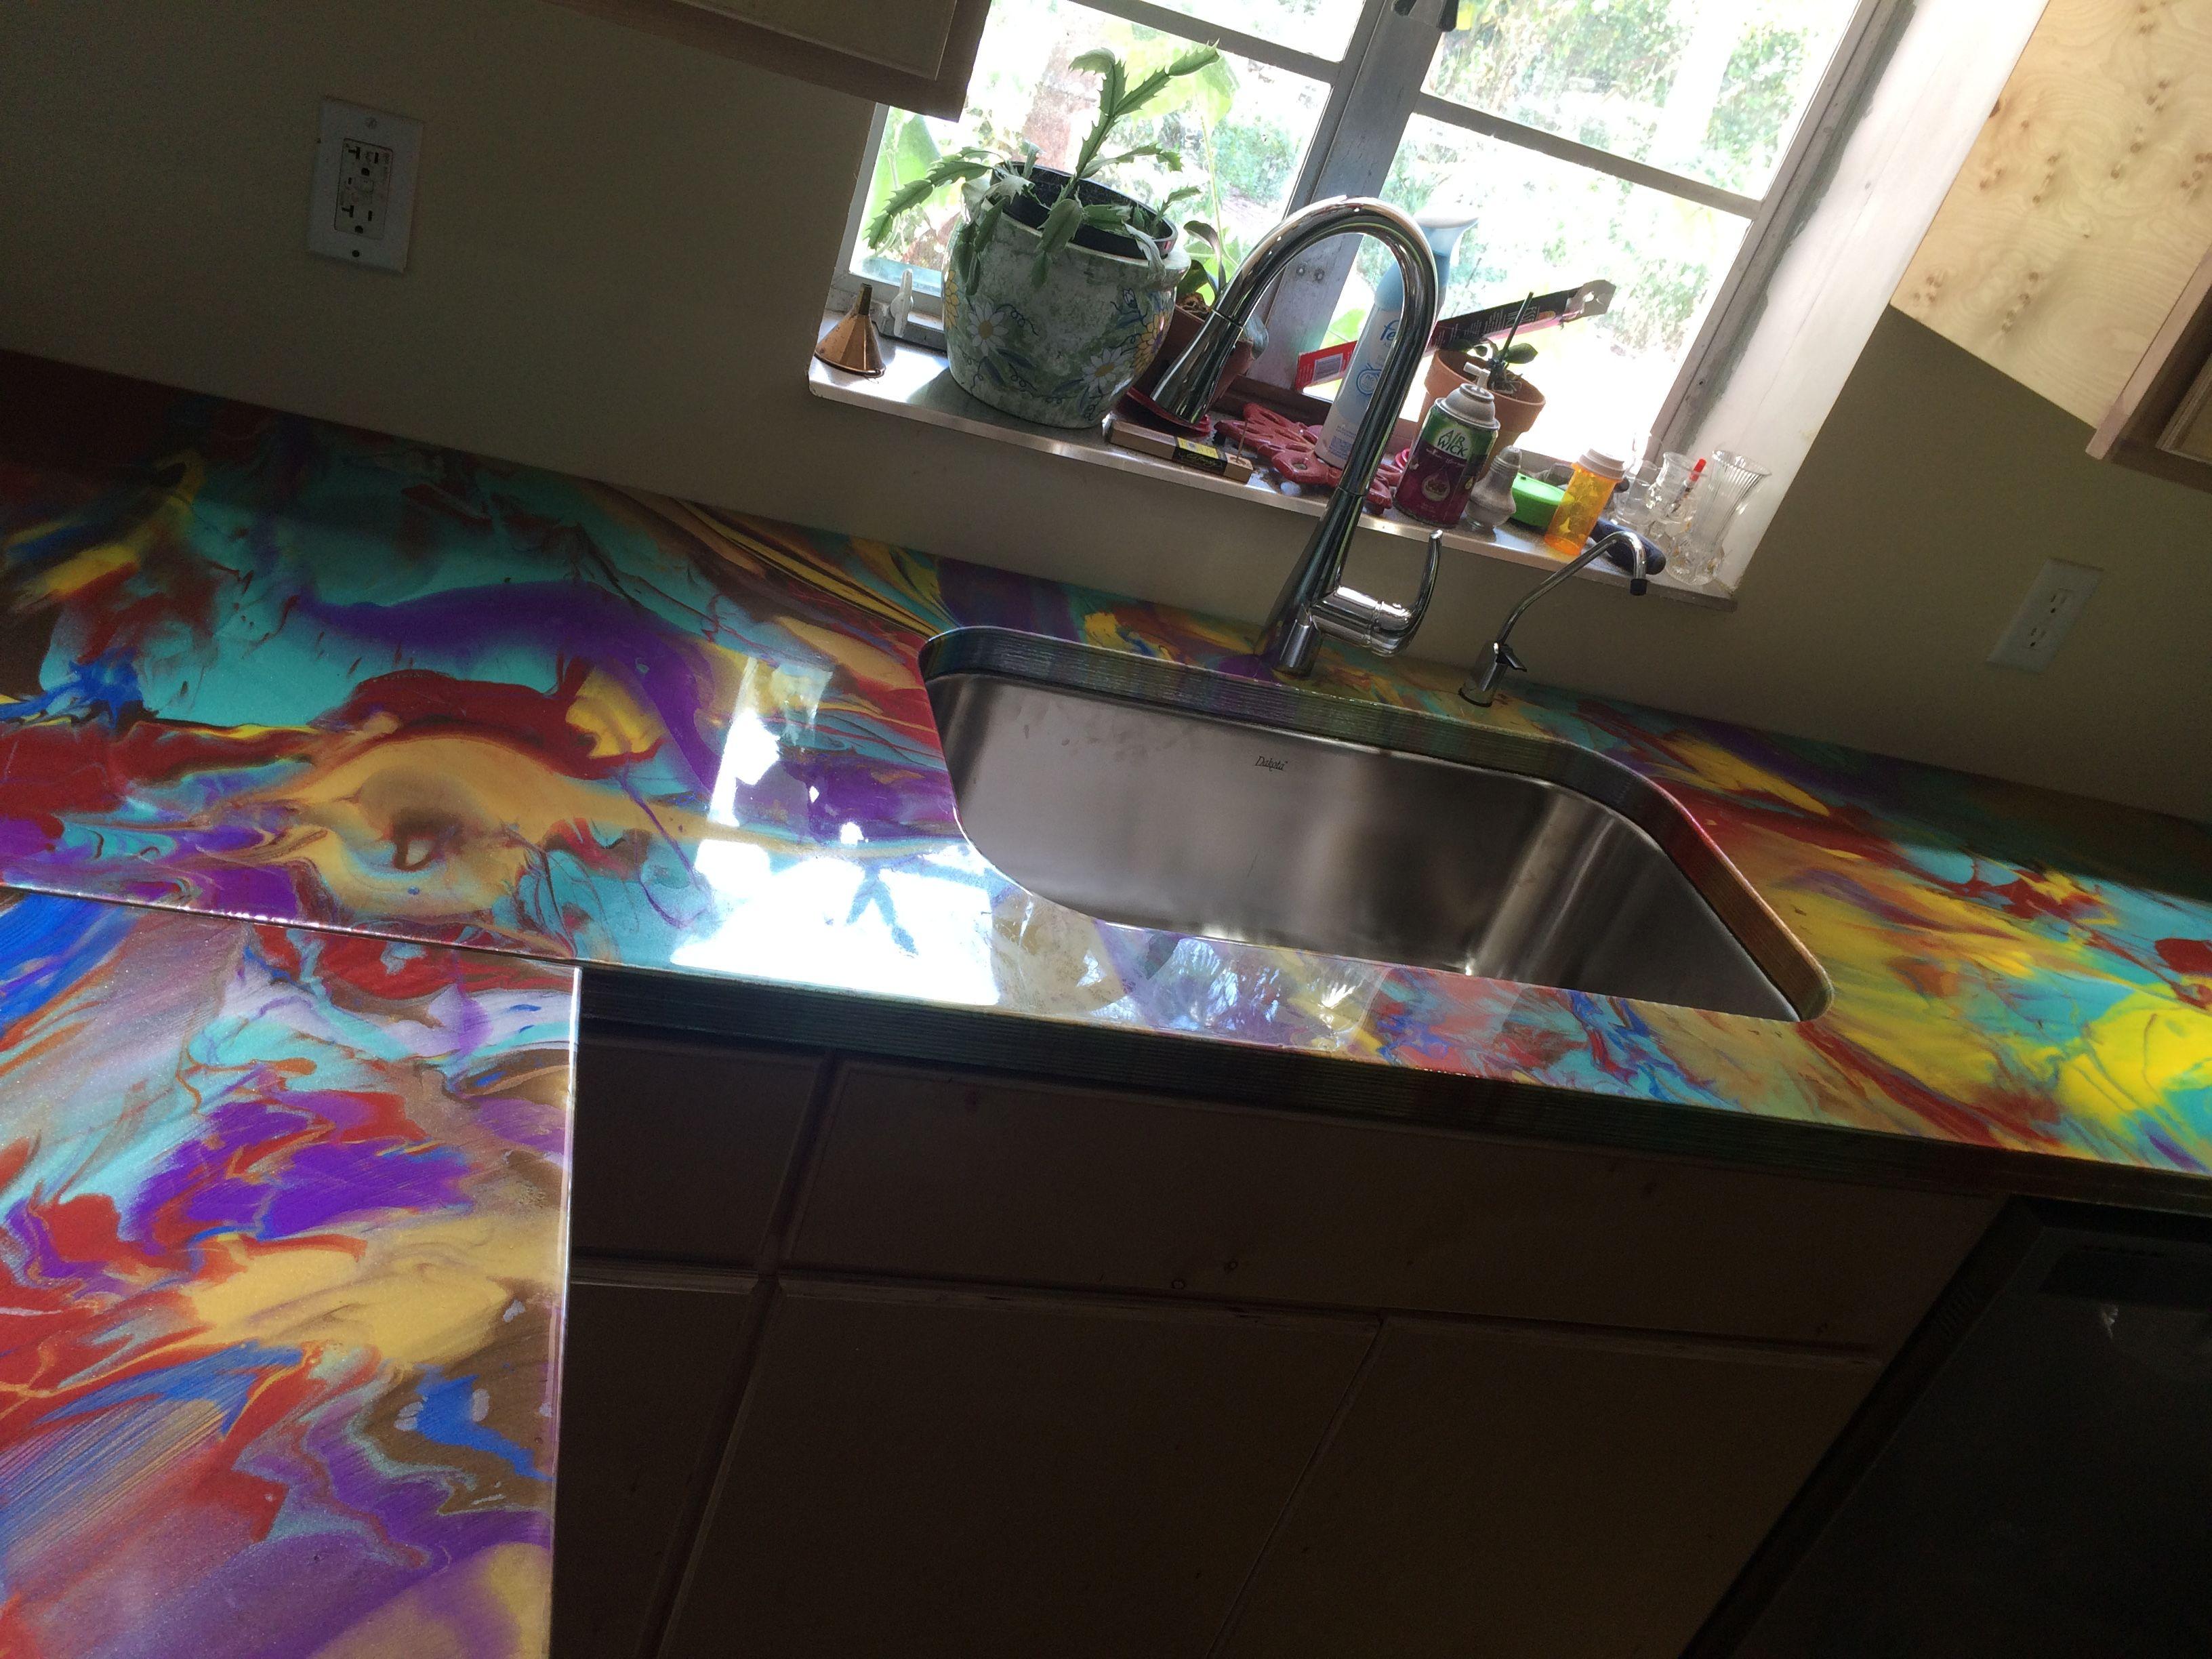 reflector enhancer epoxy kitchen counter tops under mount sink in wild colors art